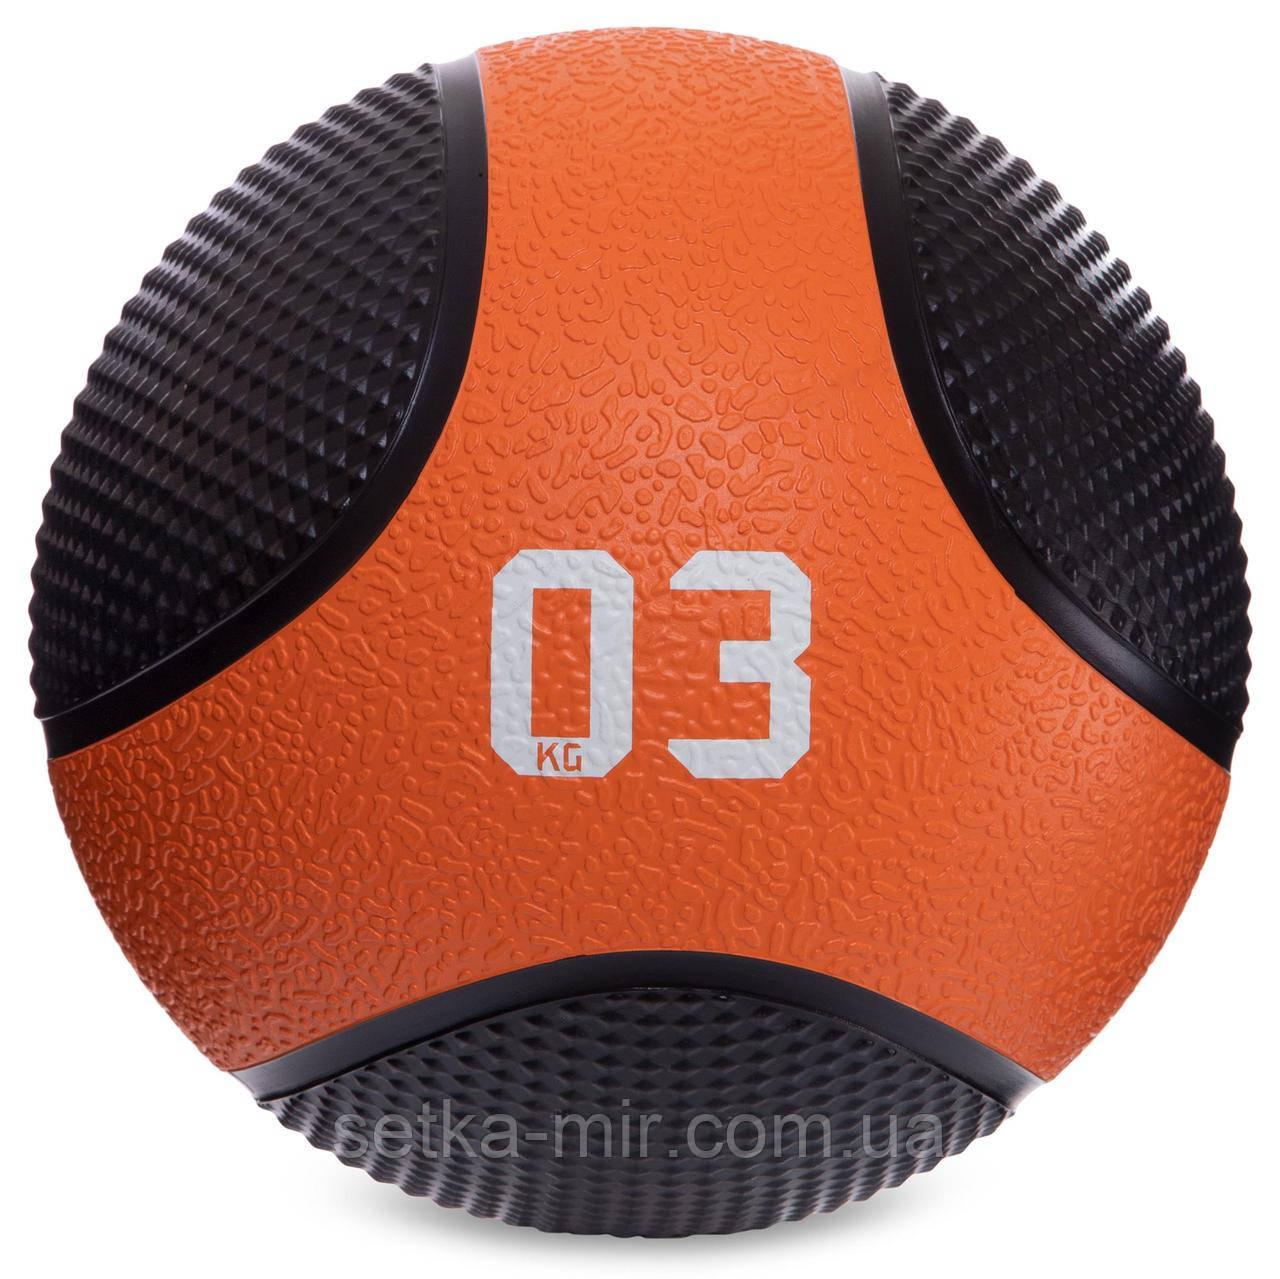 М'яч медичний медбол Medicine Ball FI-2824-3 3 кг